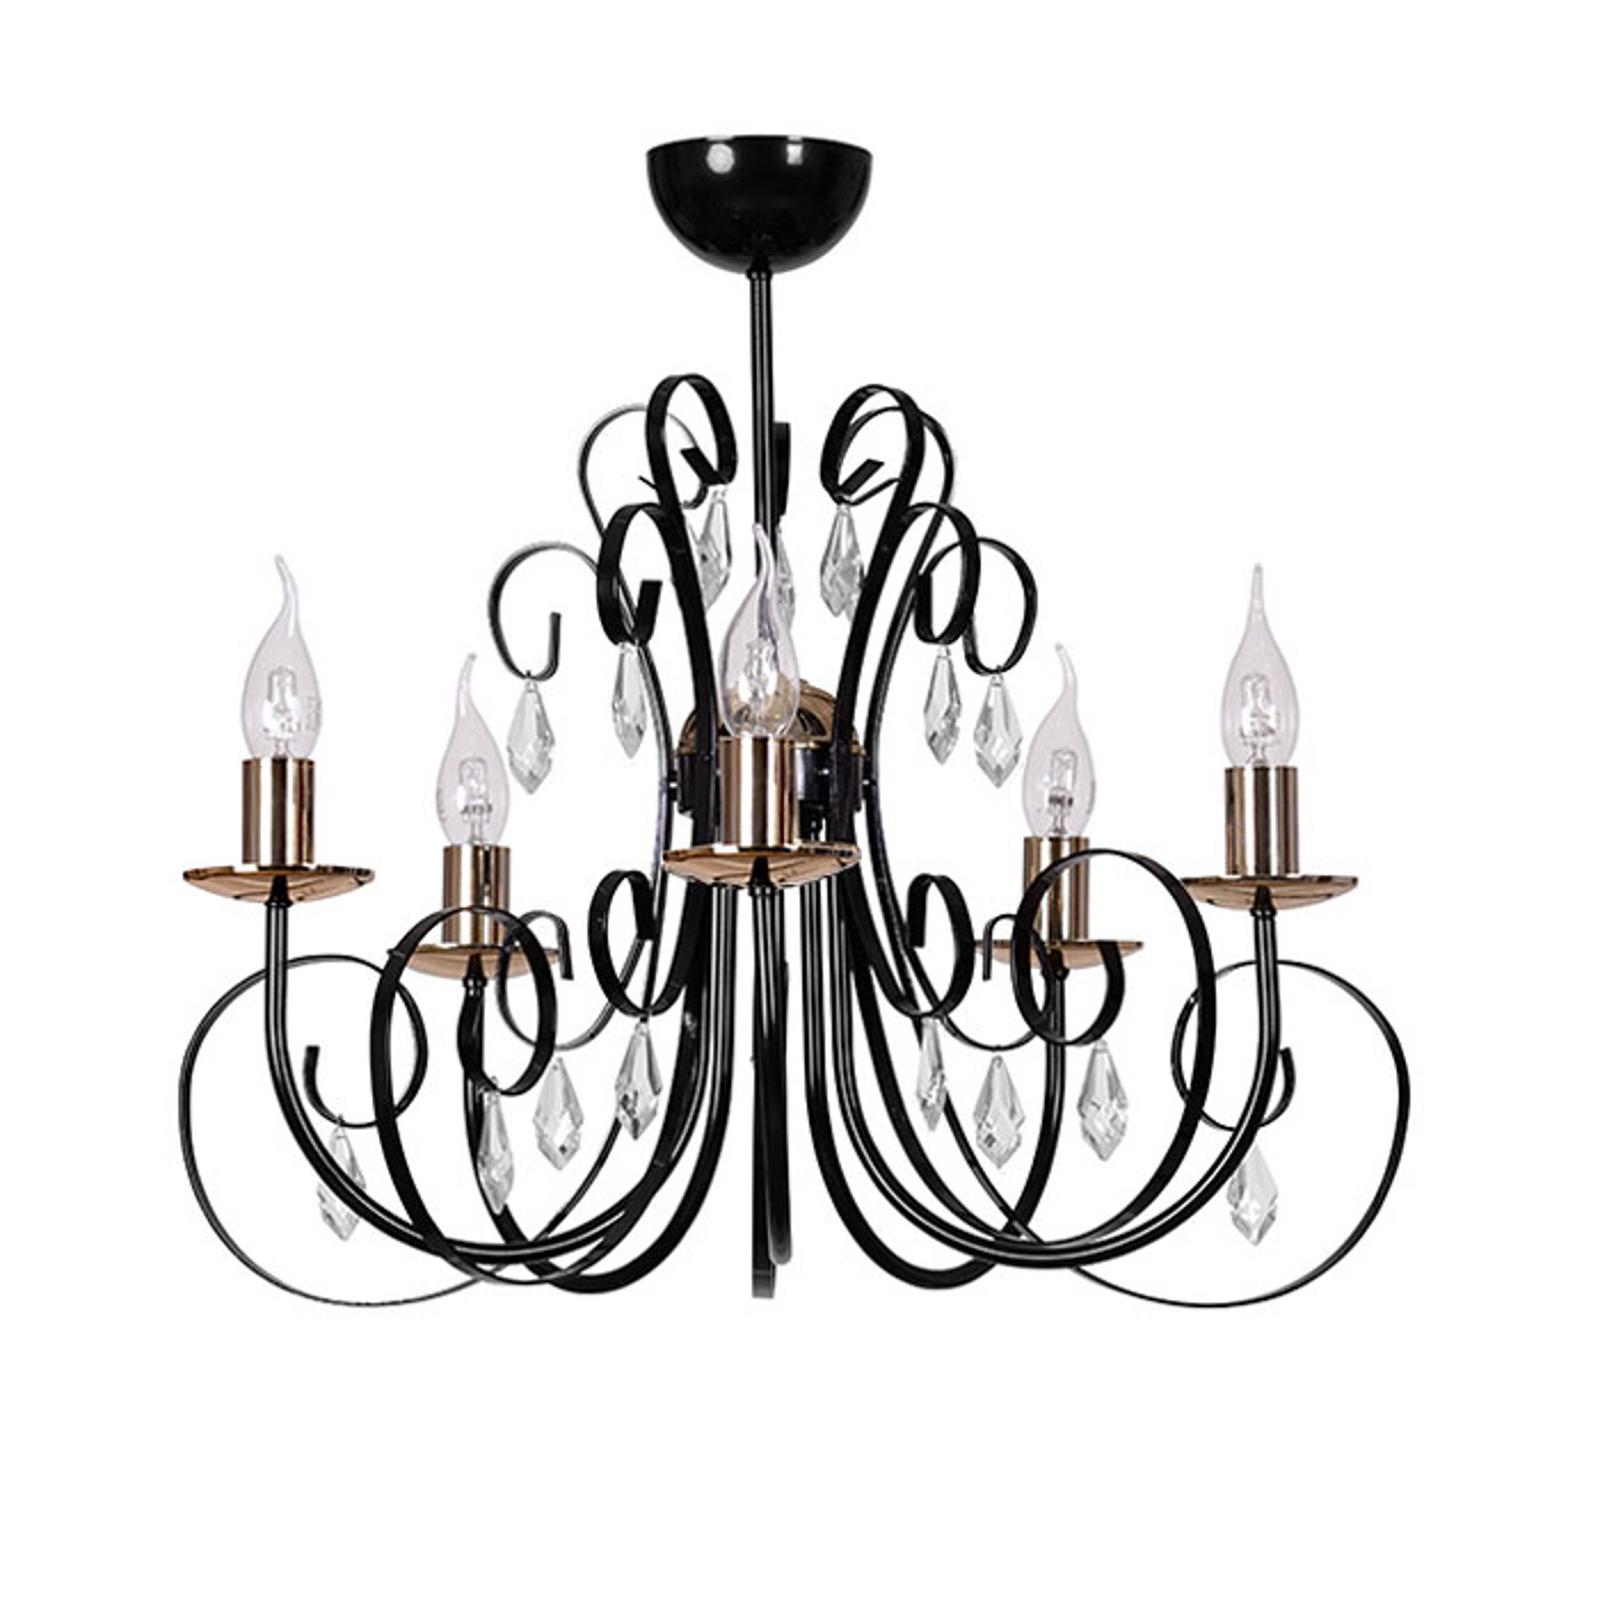 Lysekrone Foreman 5 lyskilder, svart-kobber